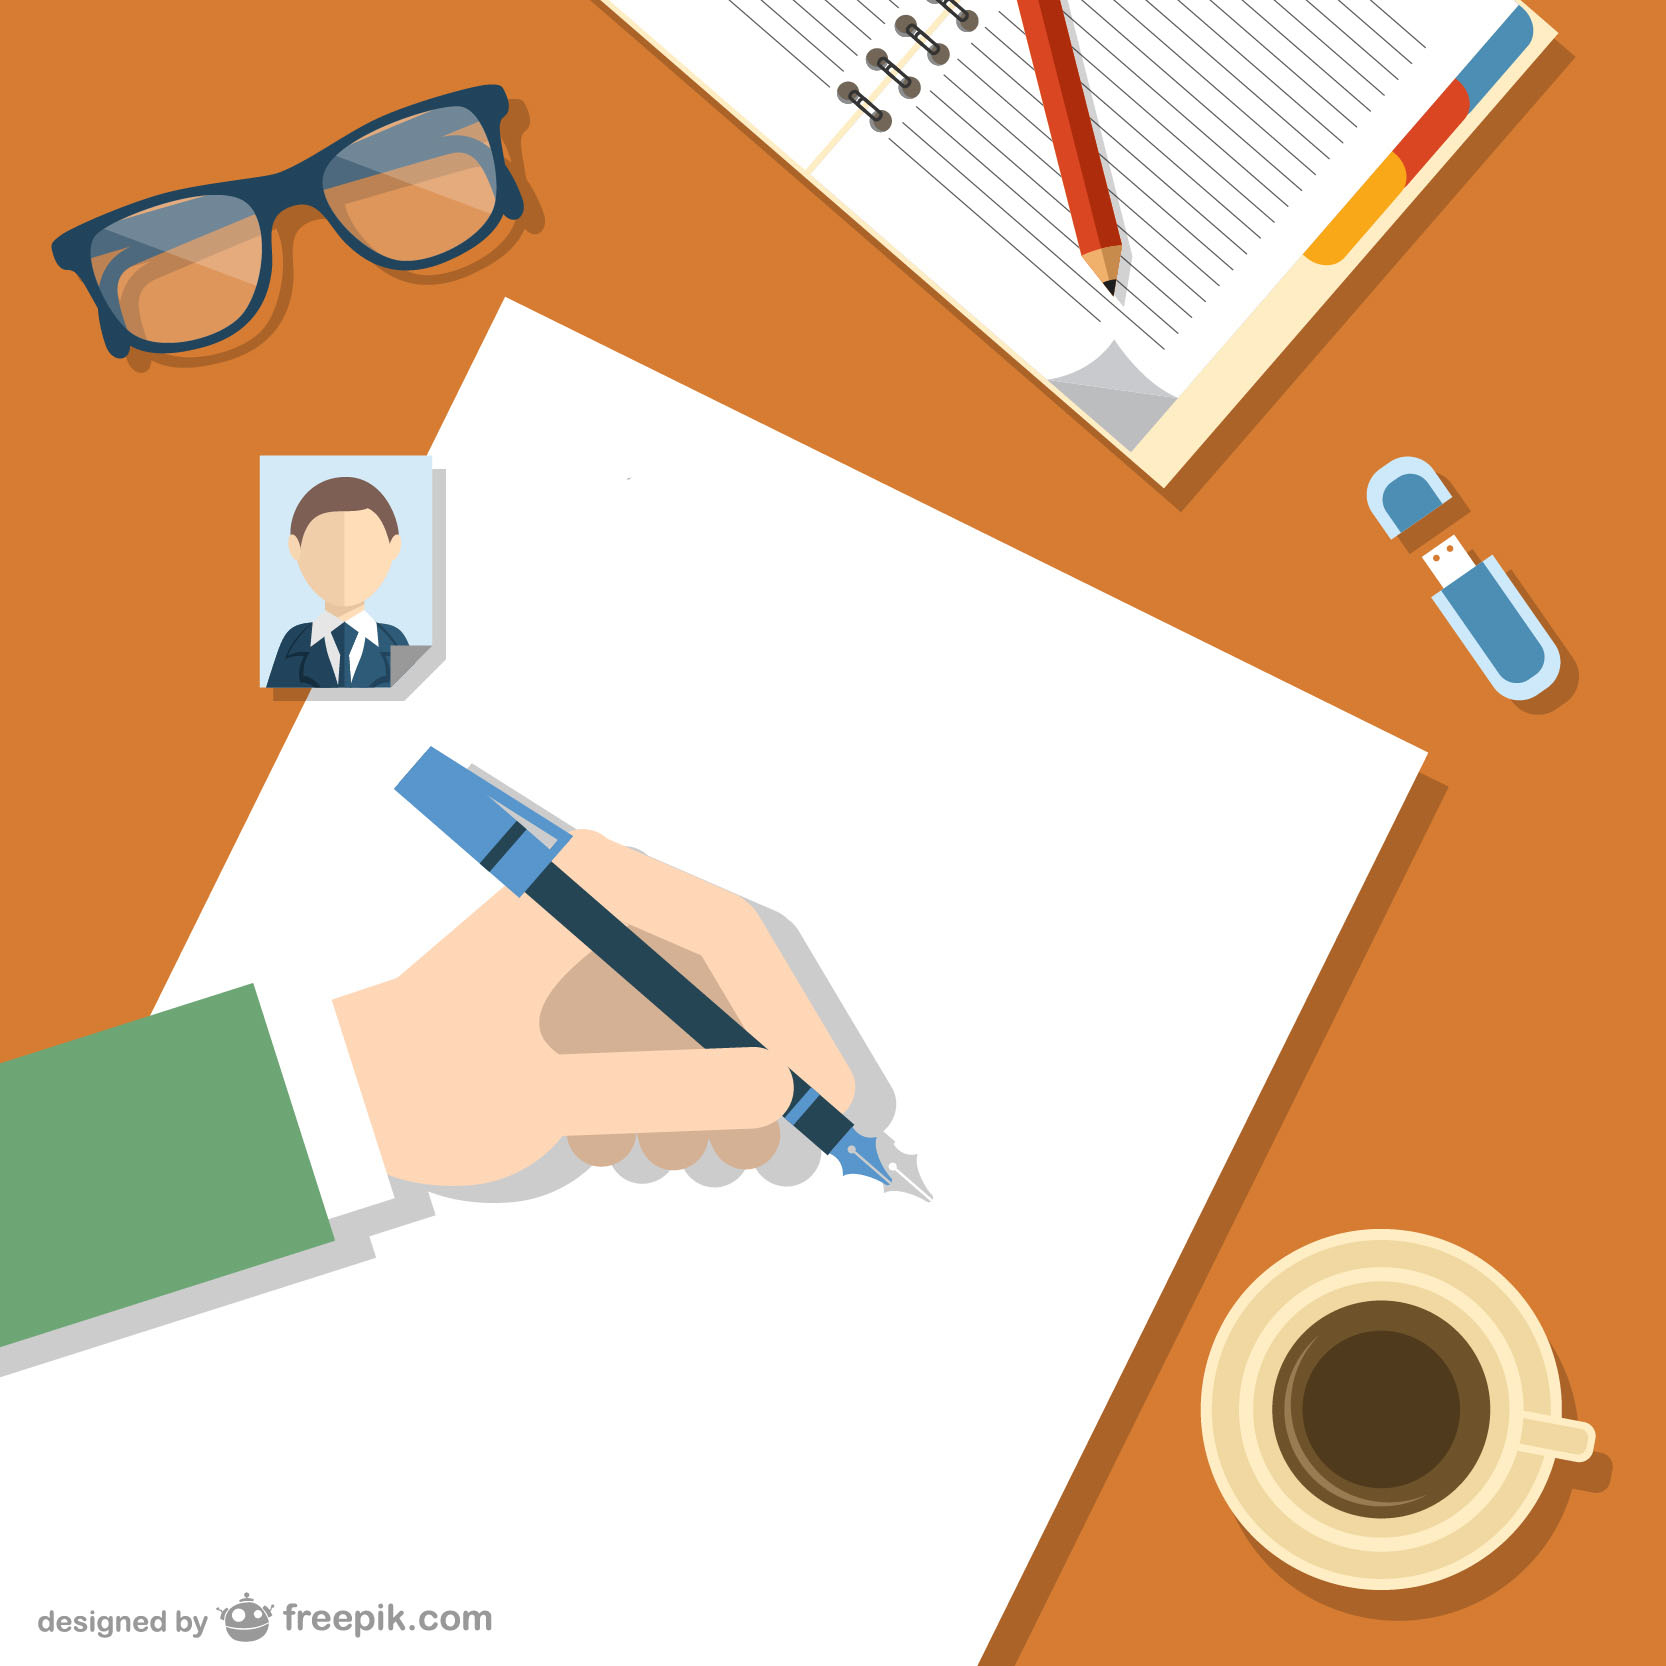 WordPress – Easy Writing Tips